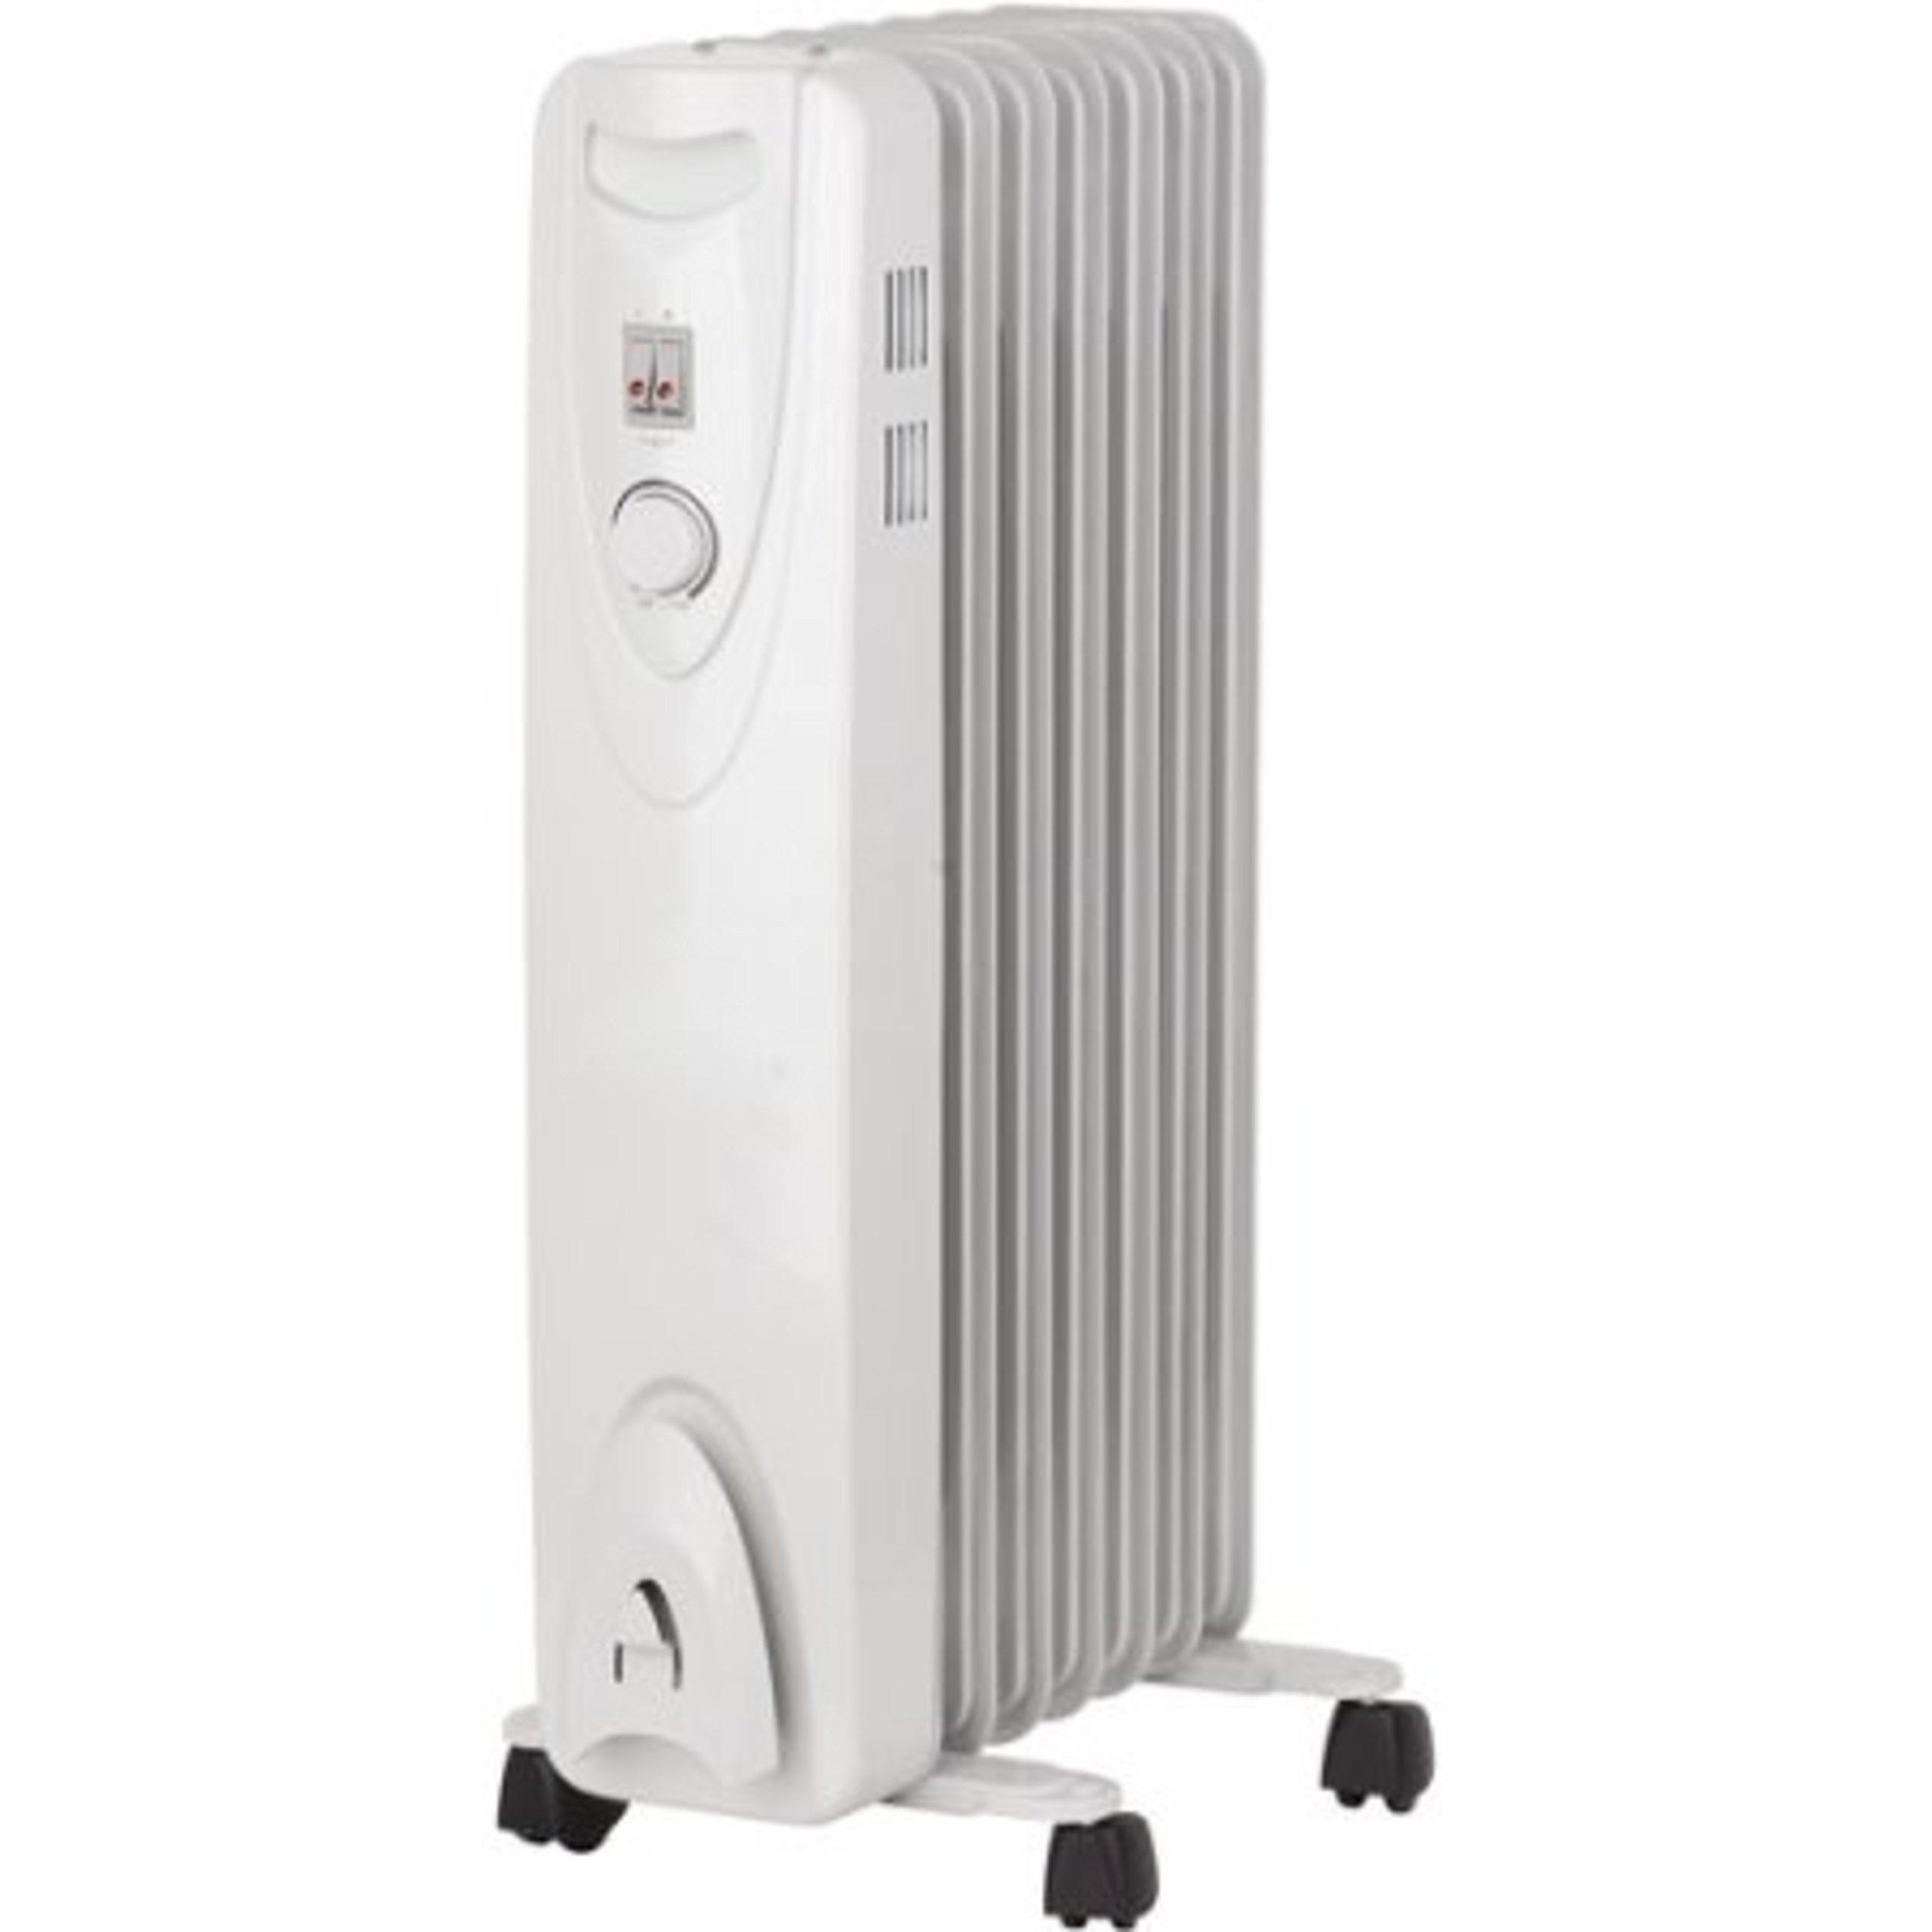 Portable Automatic Thermostat Control 3 Heat Settings Radiator Heater